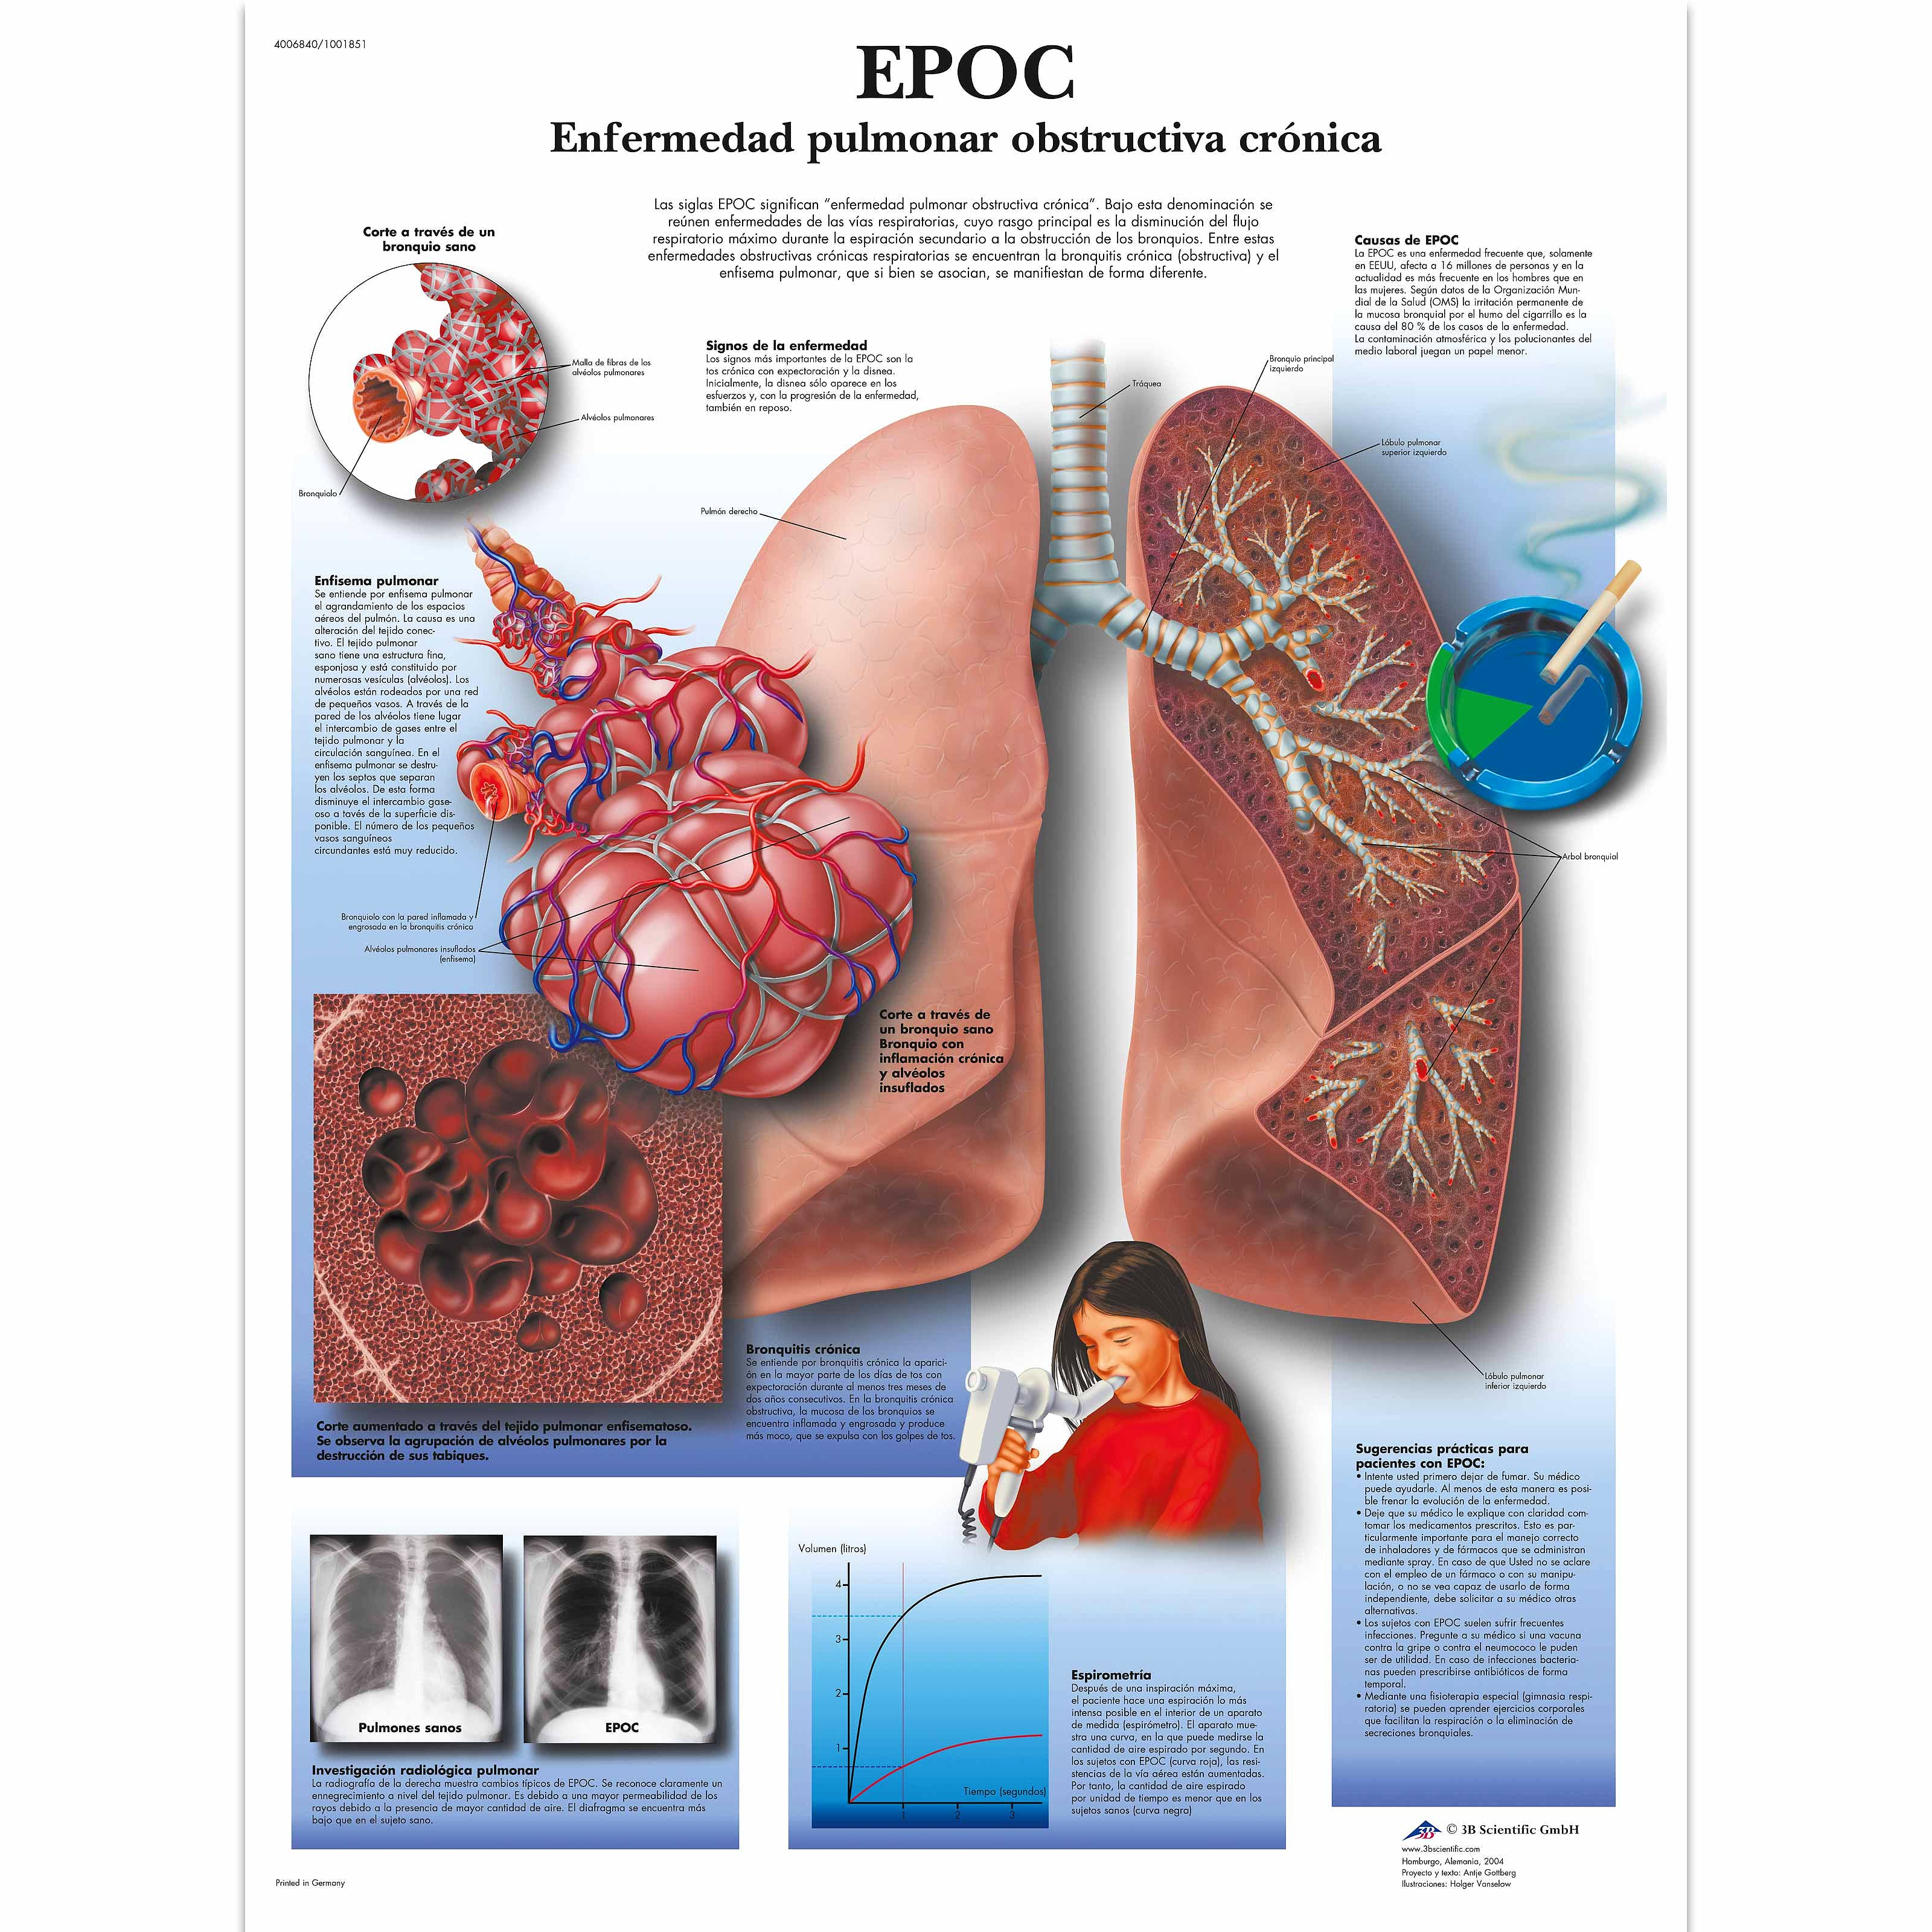 Lámina EPOC-Enfermedad Pulmonar Obstructiva Crónica (formato 50 x 67 cm)